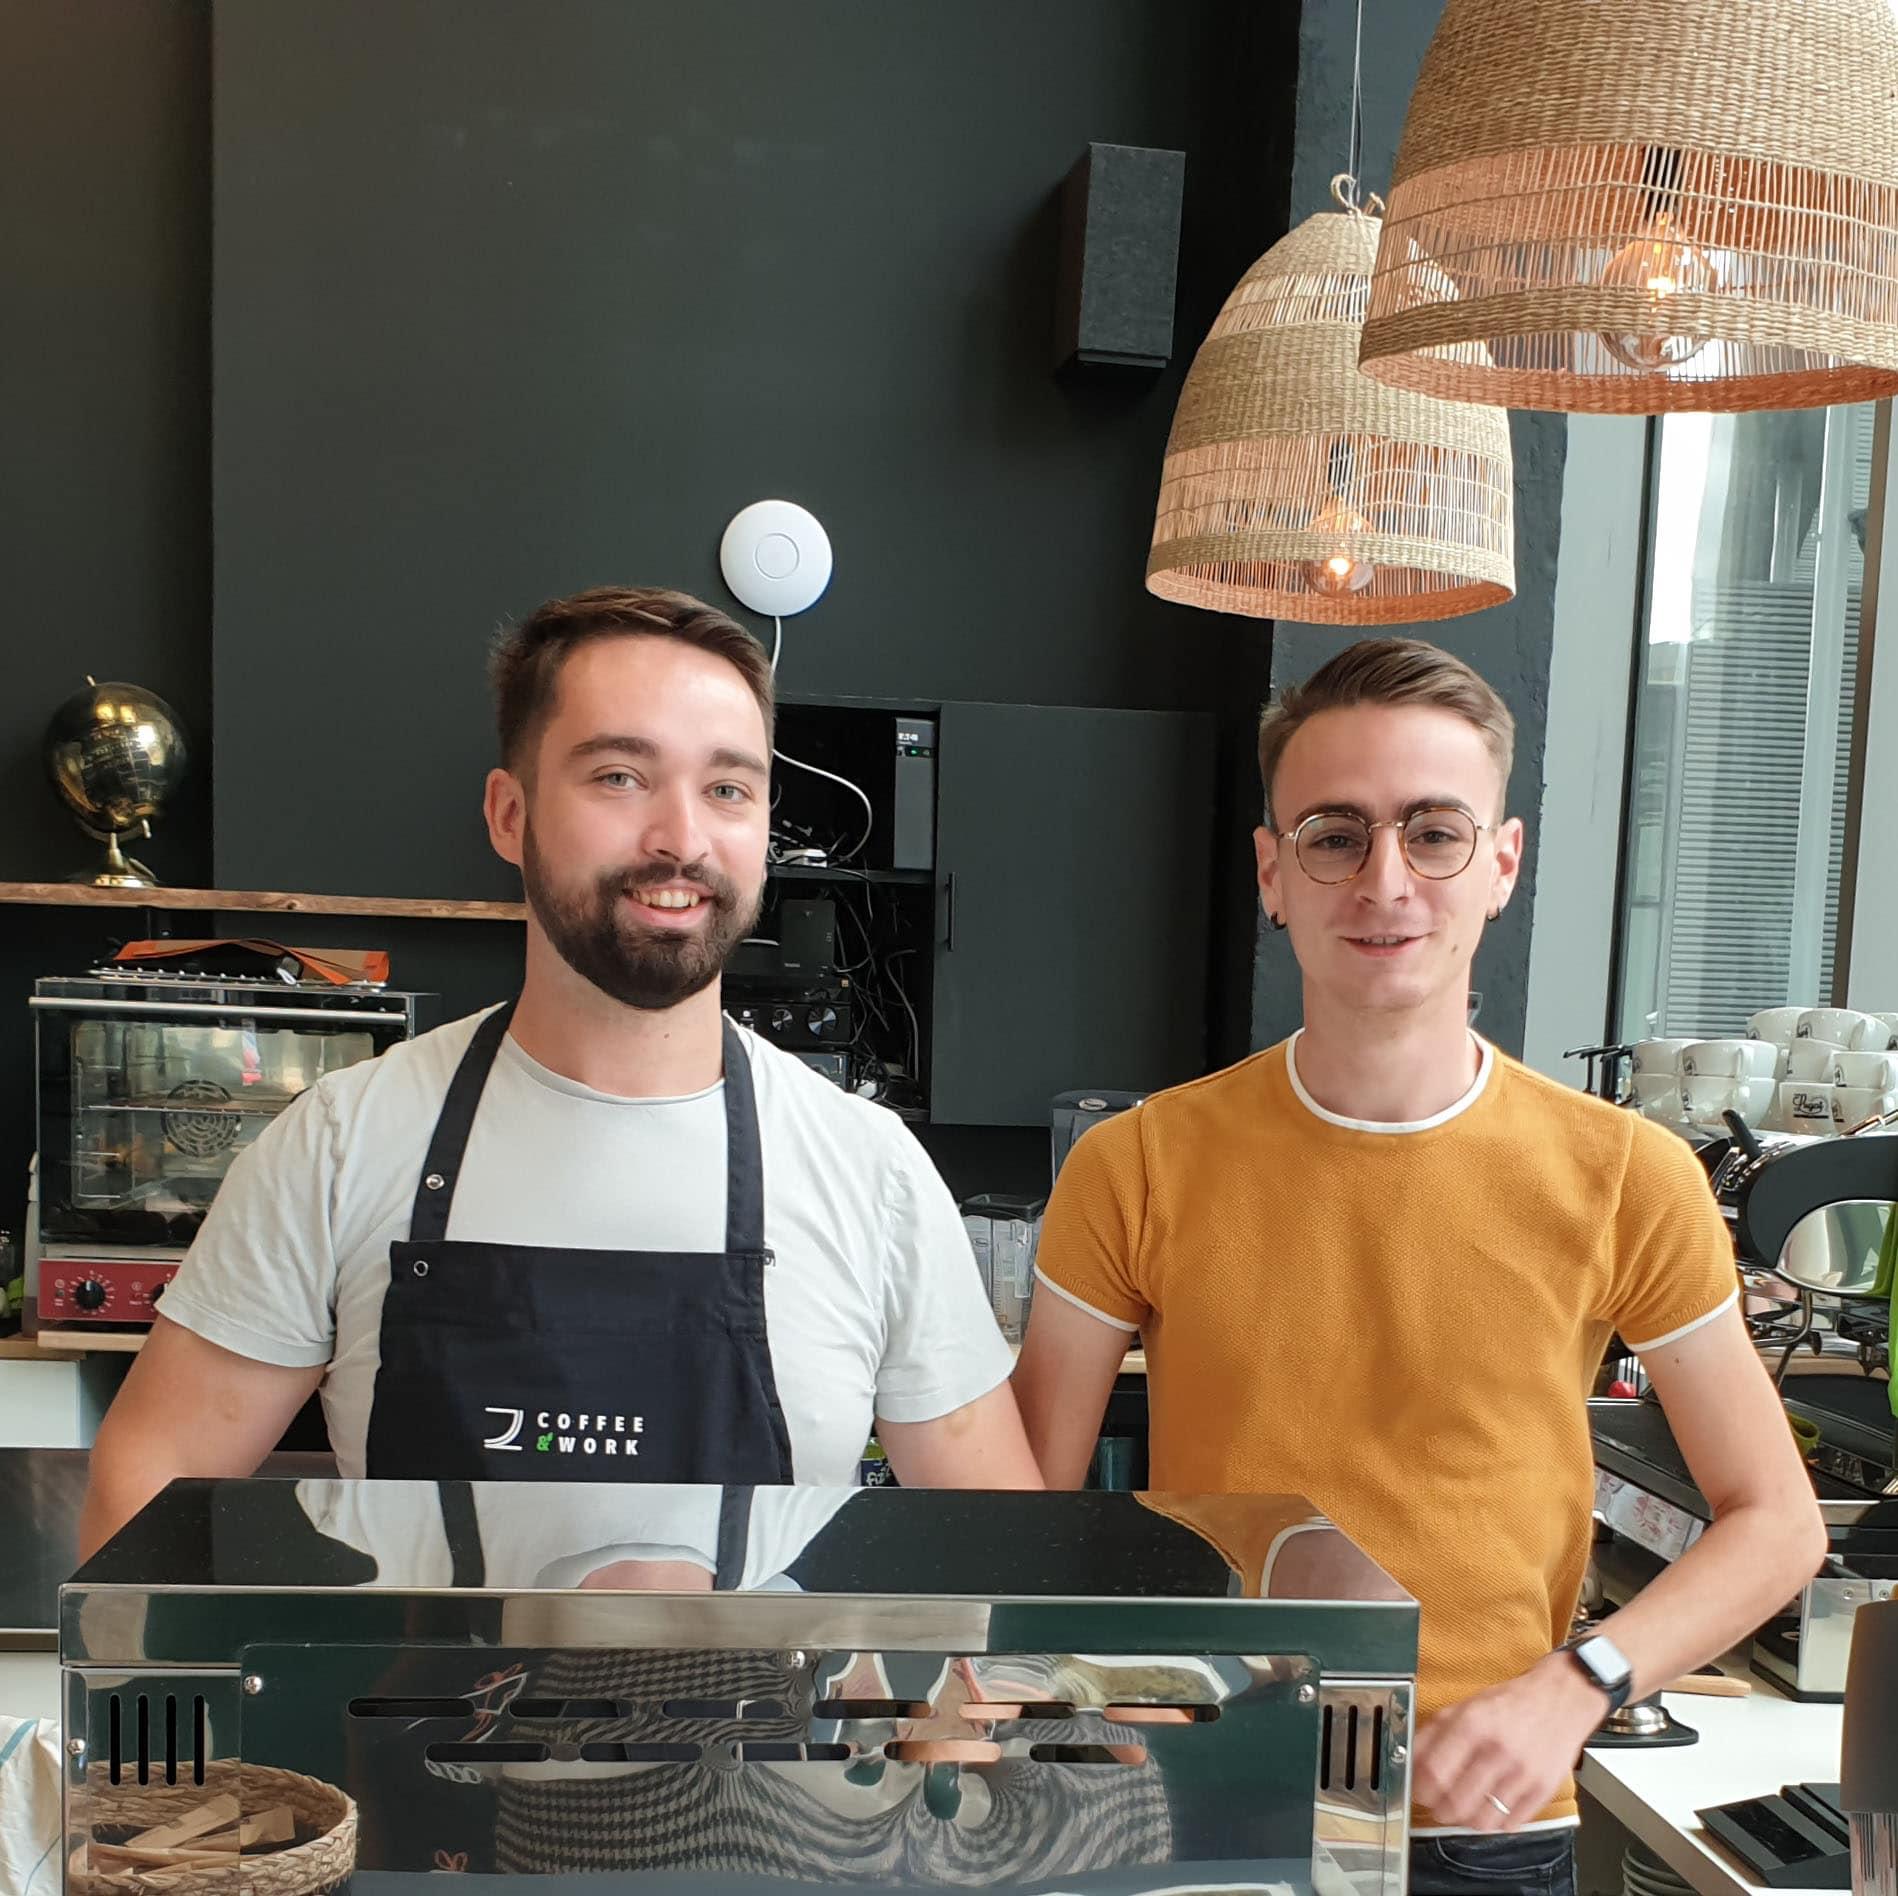 Bruno et Baptiste & Coffee & Work